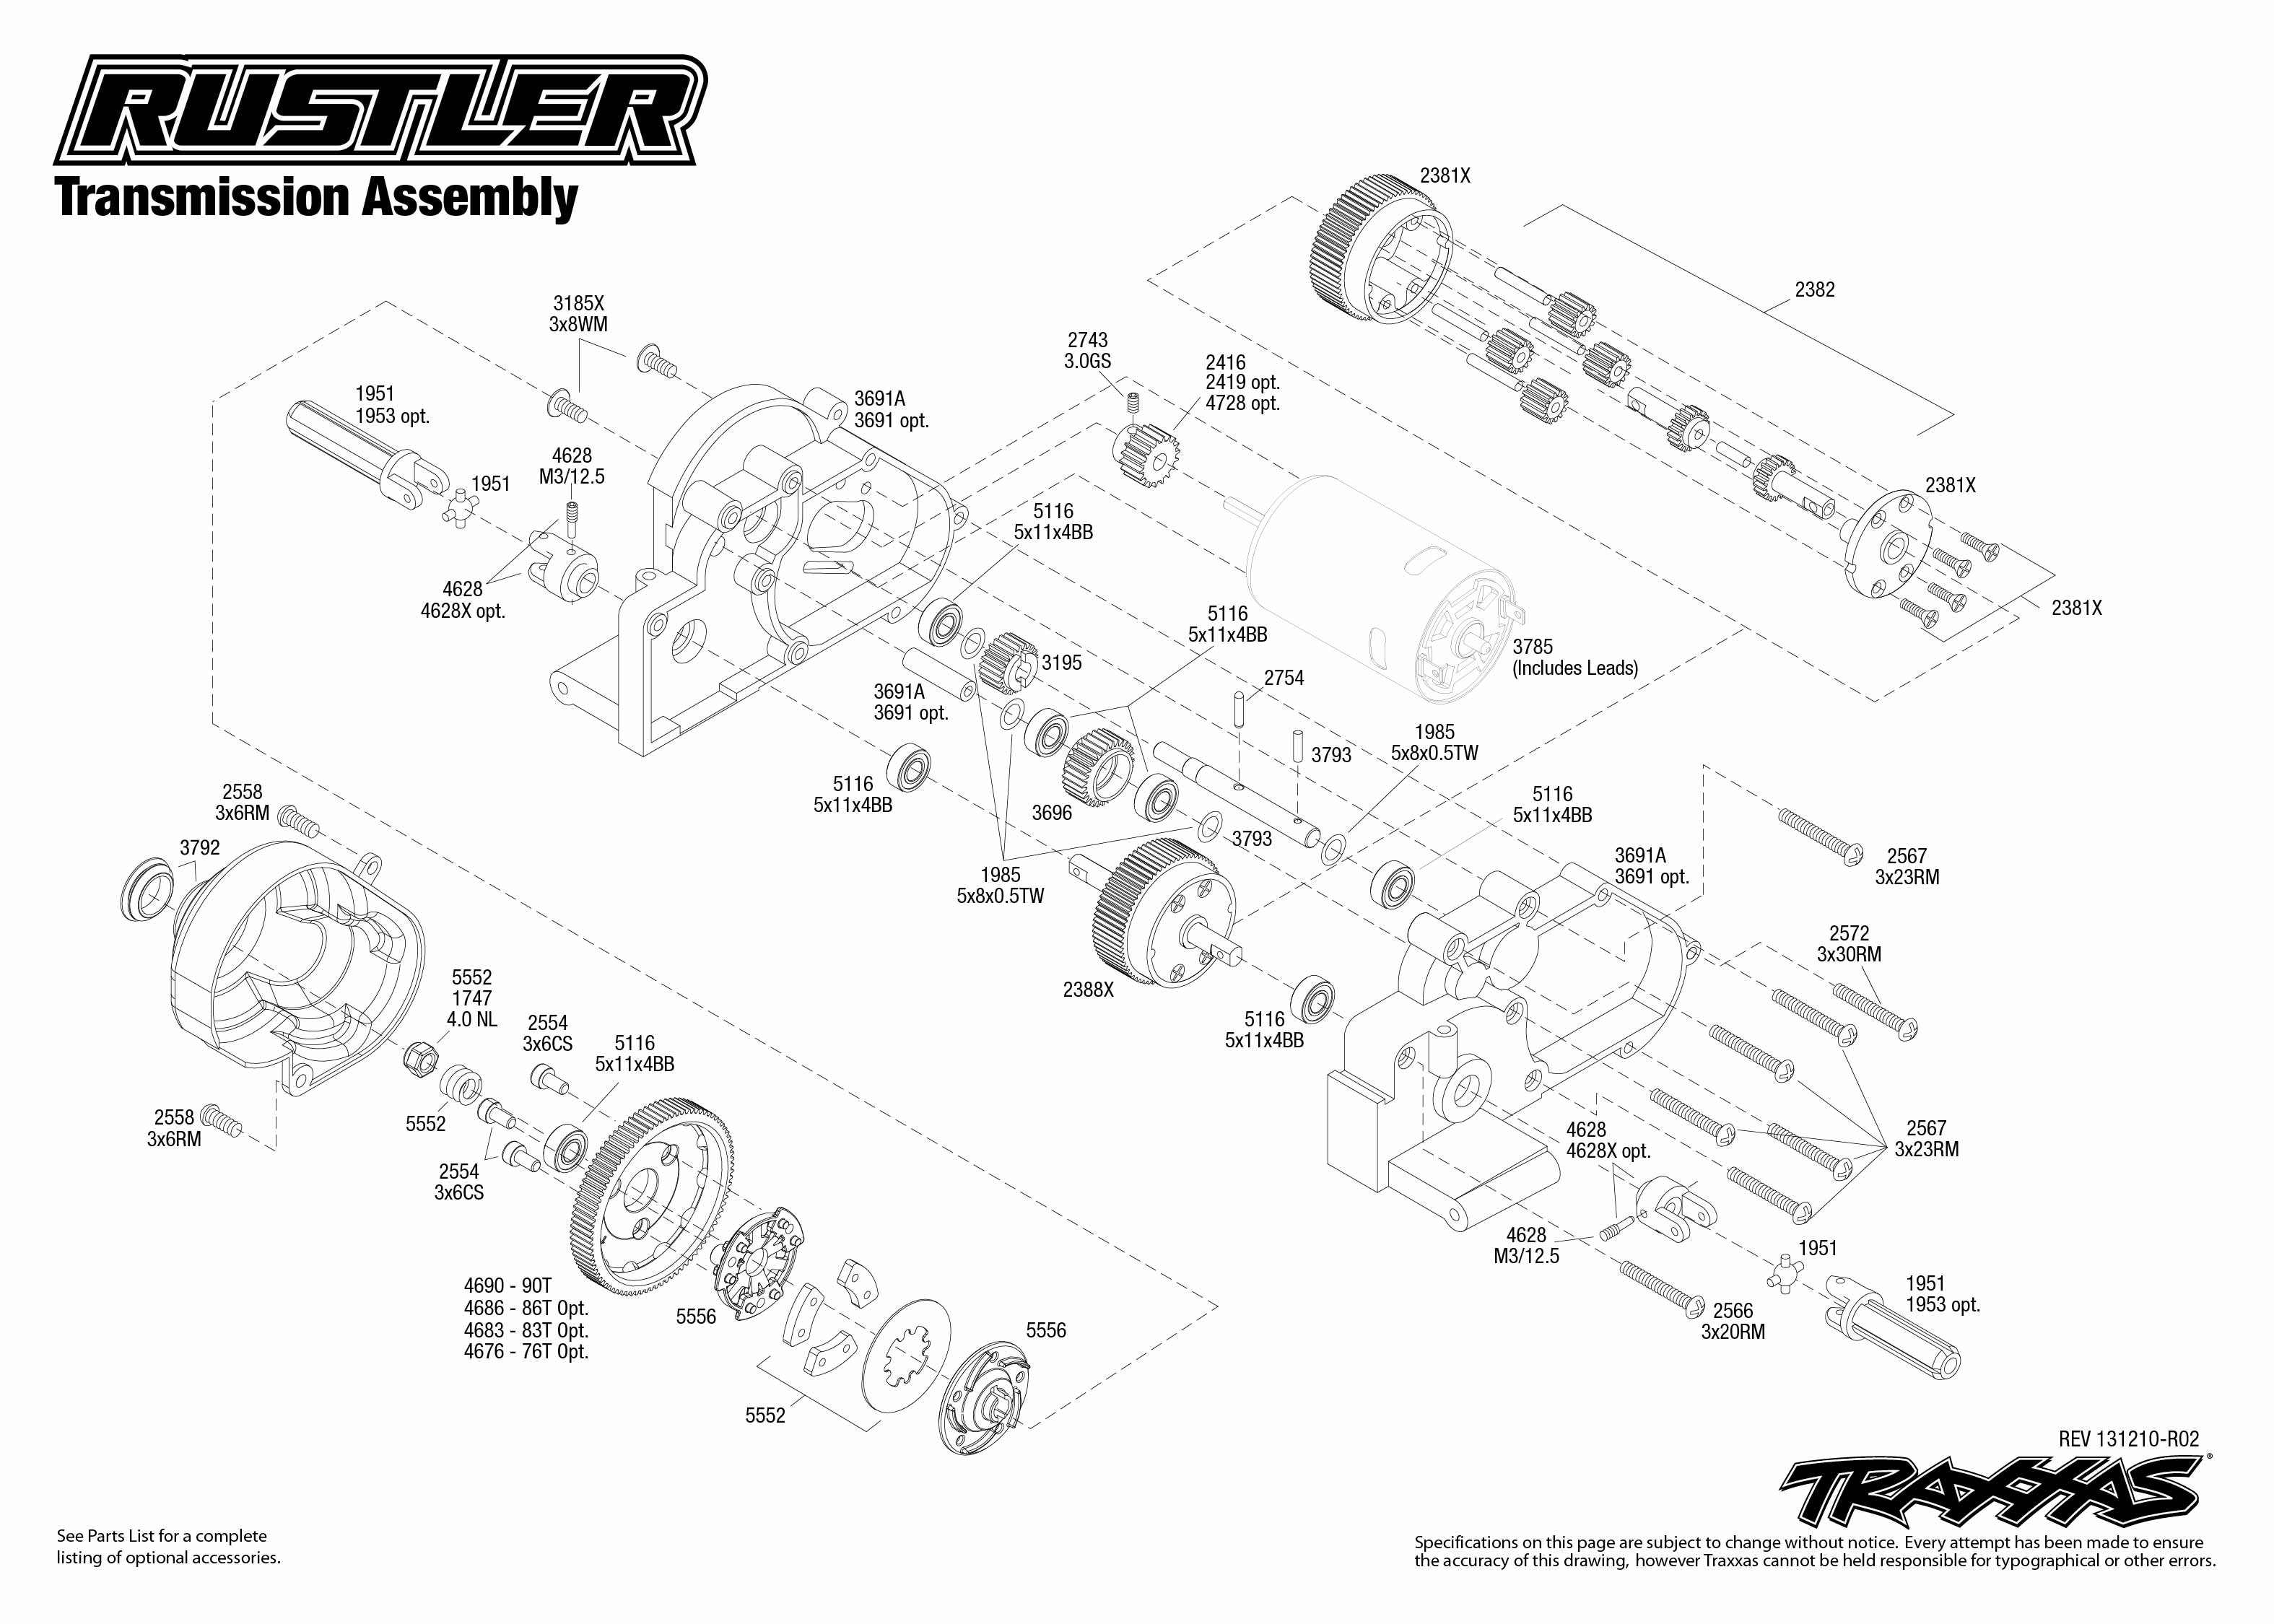 Rustler Transmission Assembly